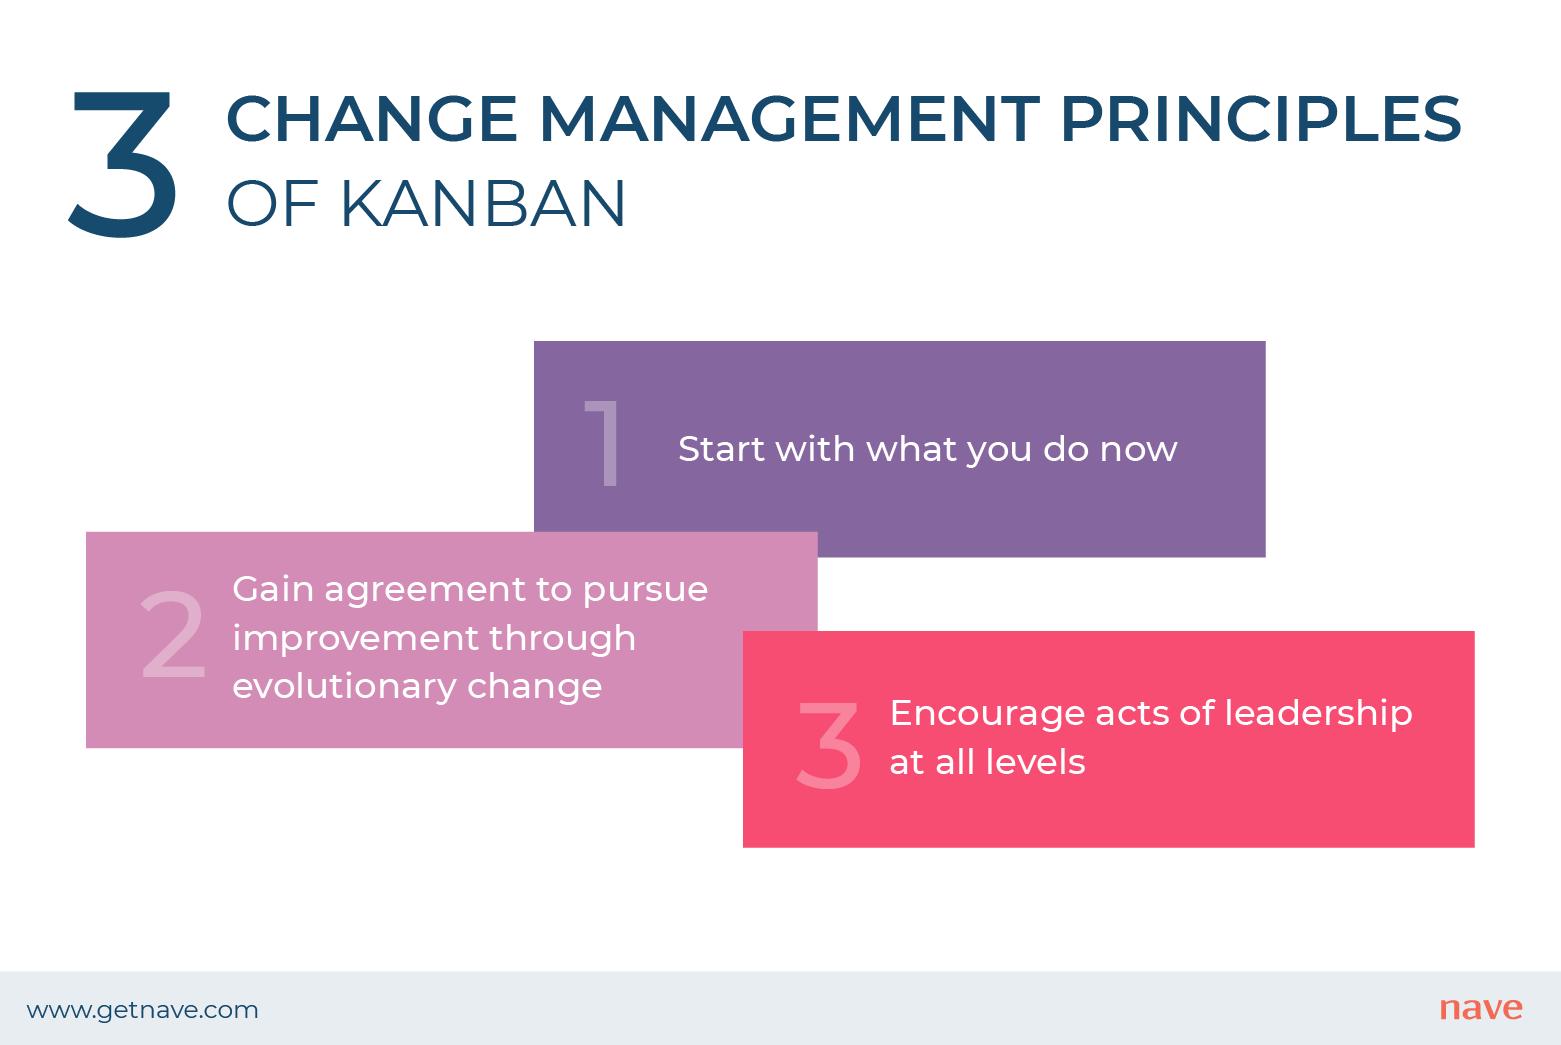 The three change management principles of Kanban